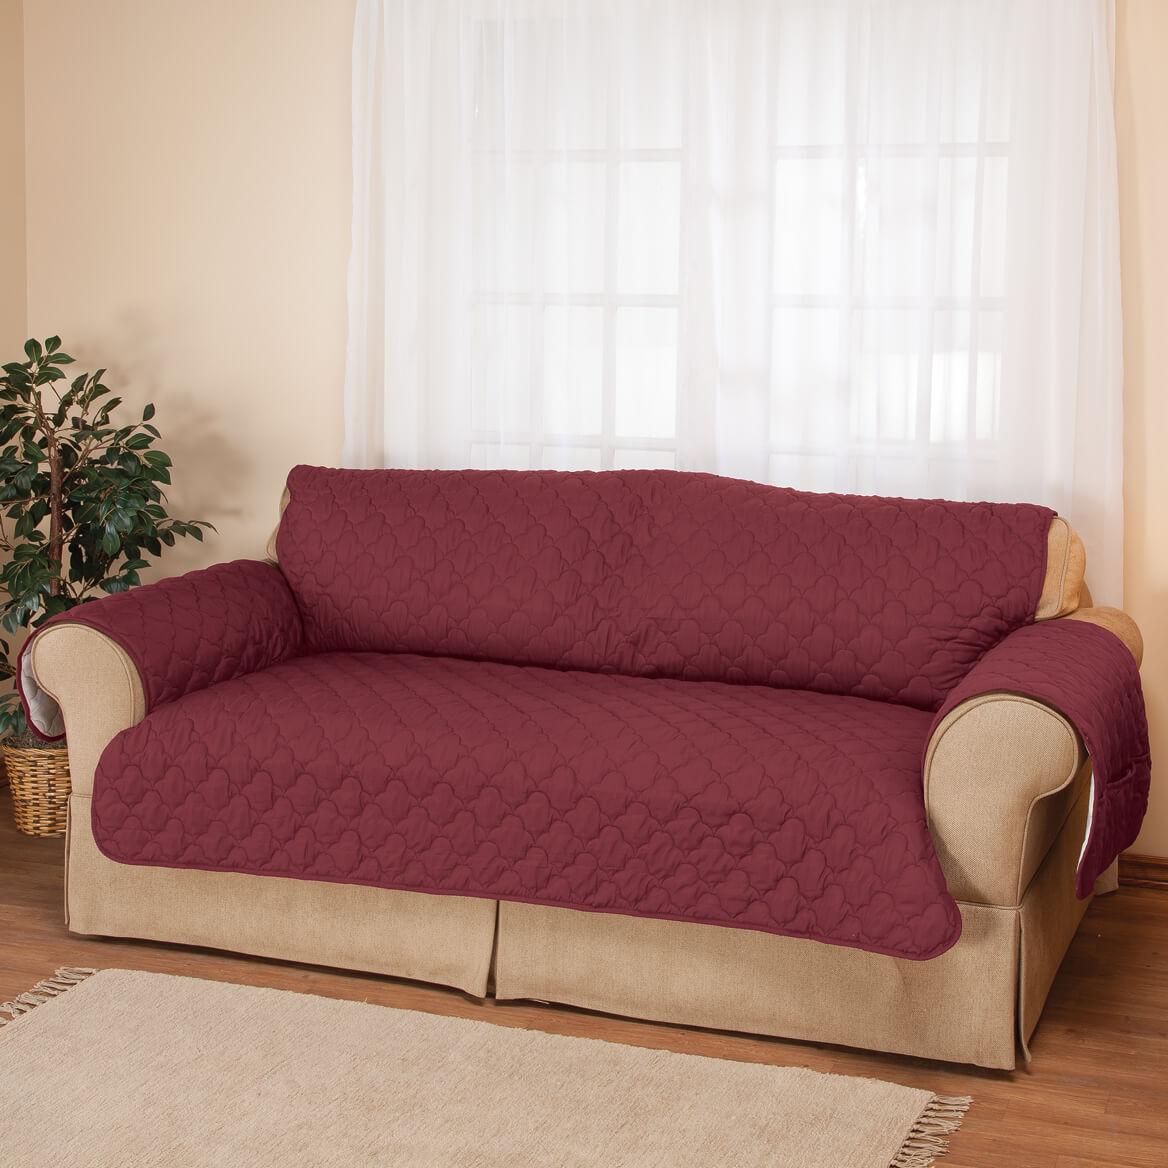 Deluxe Microfiber Sofa Cover by OakRidge™-358280